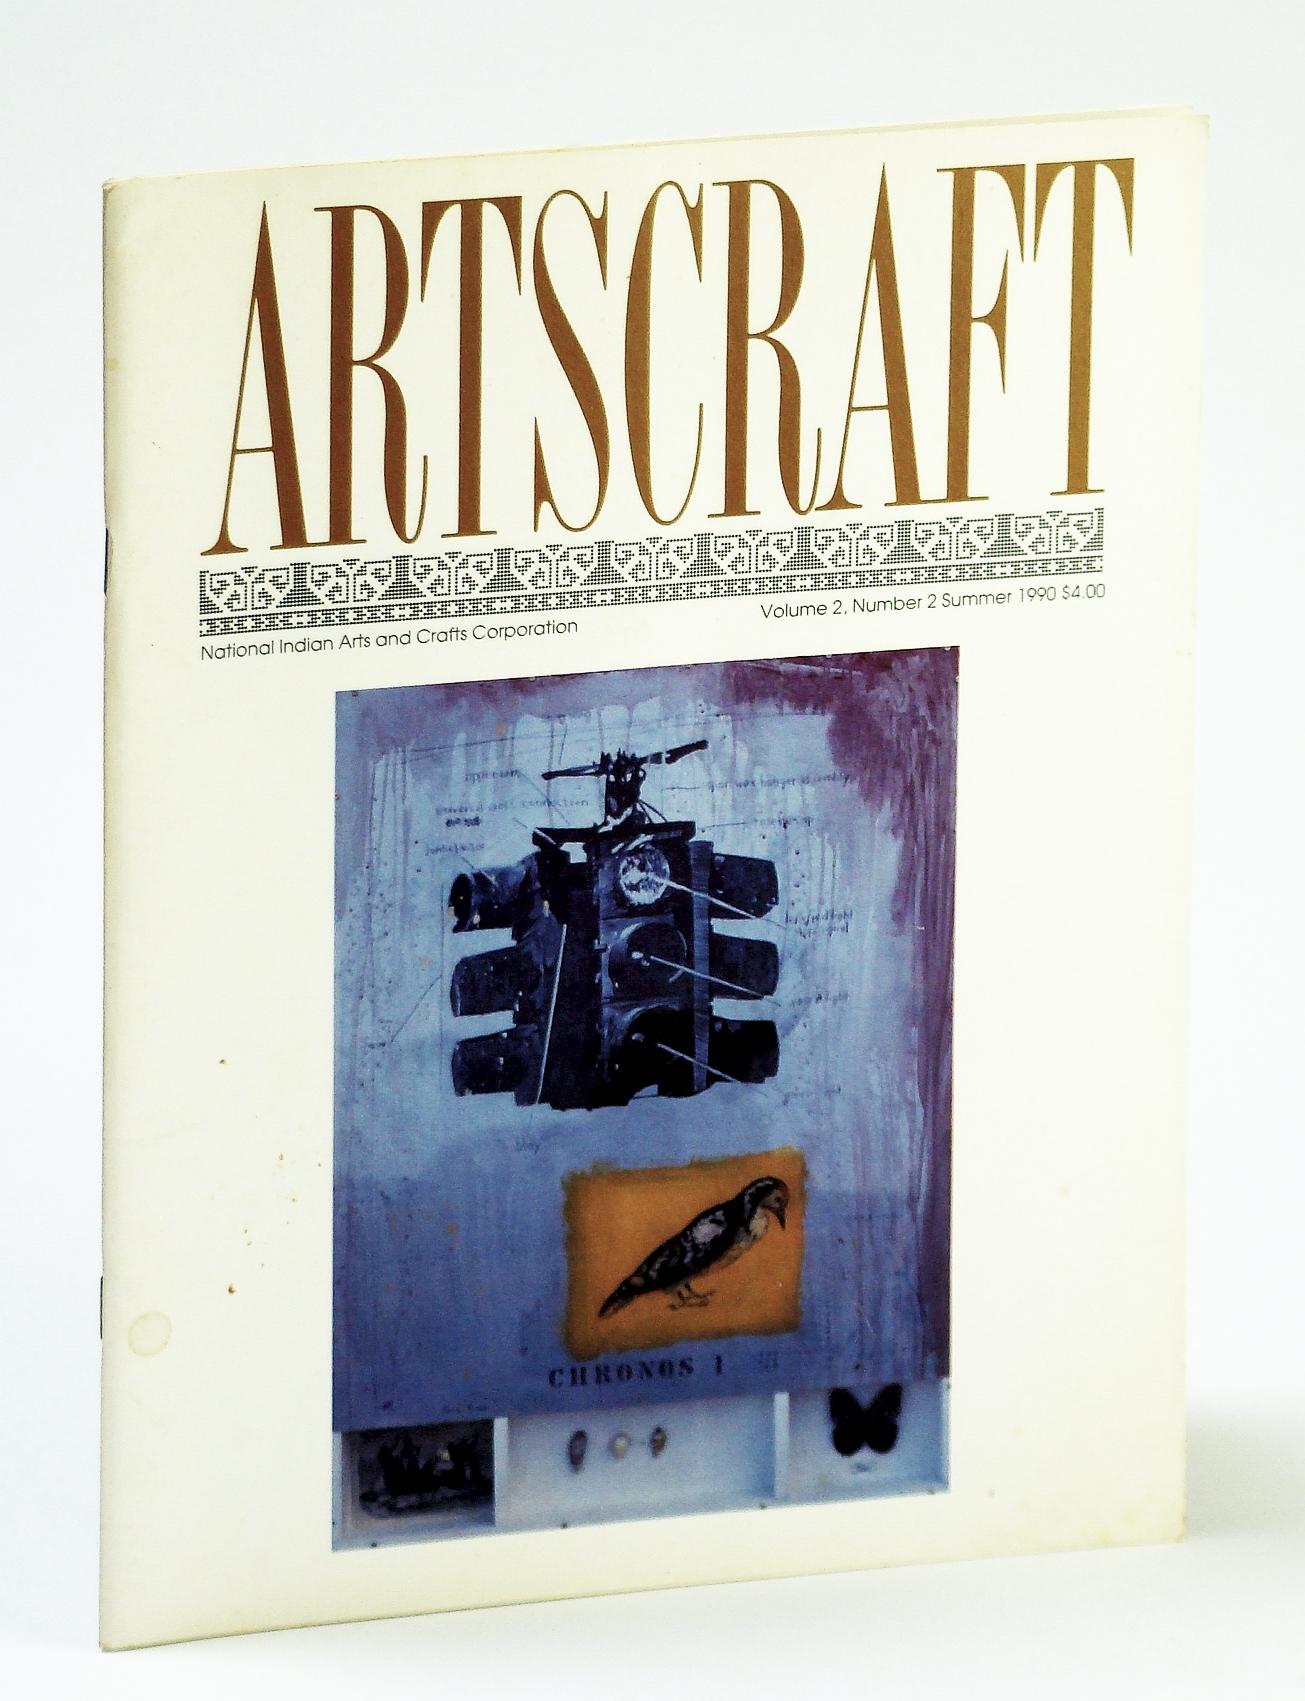 Image for Artscraft Magazine, Volume 2, Number 2, Summer 1990: Carl Beam's Columbus Project